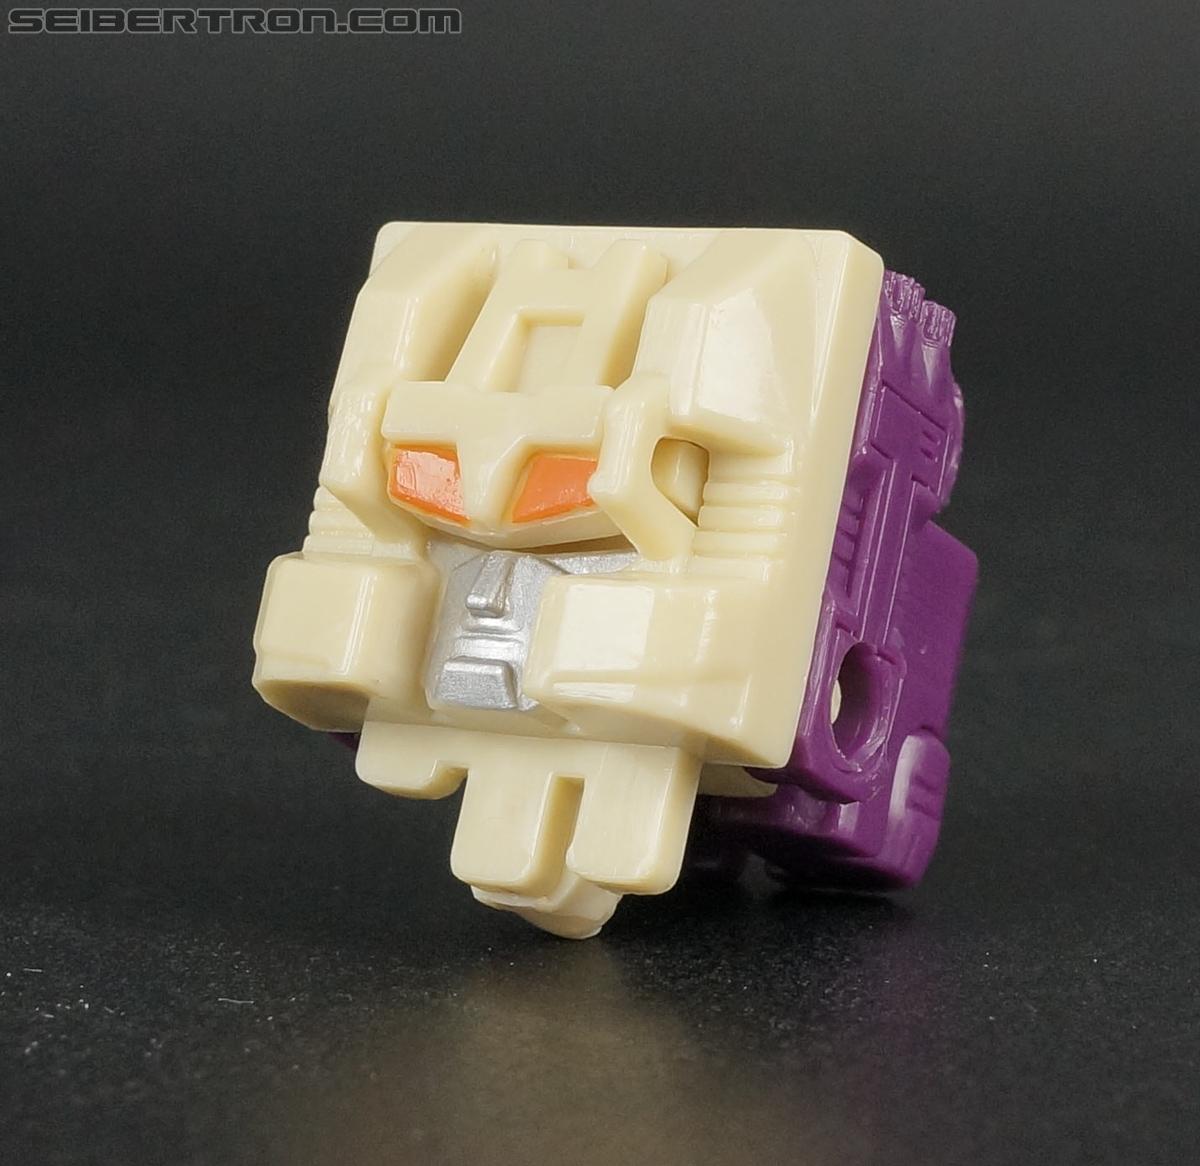 Transformers G1 1987 Lord Zarak (Scorponok) (Image #9 of 116)